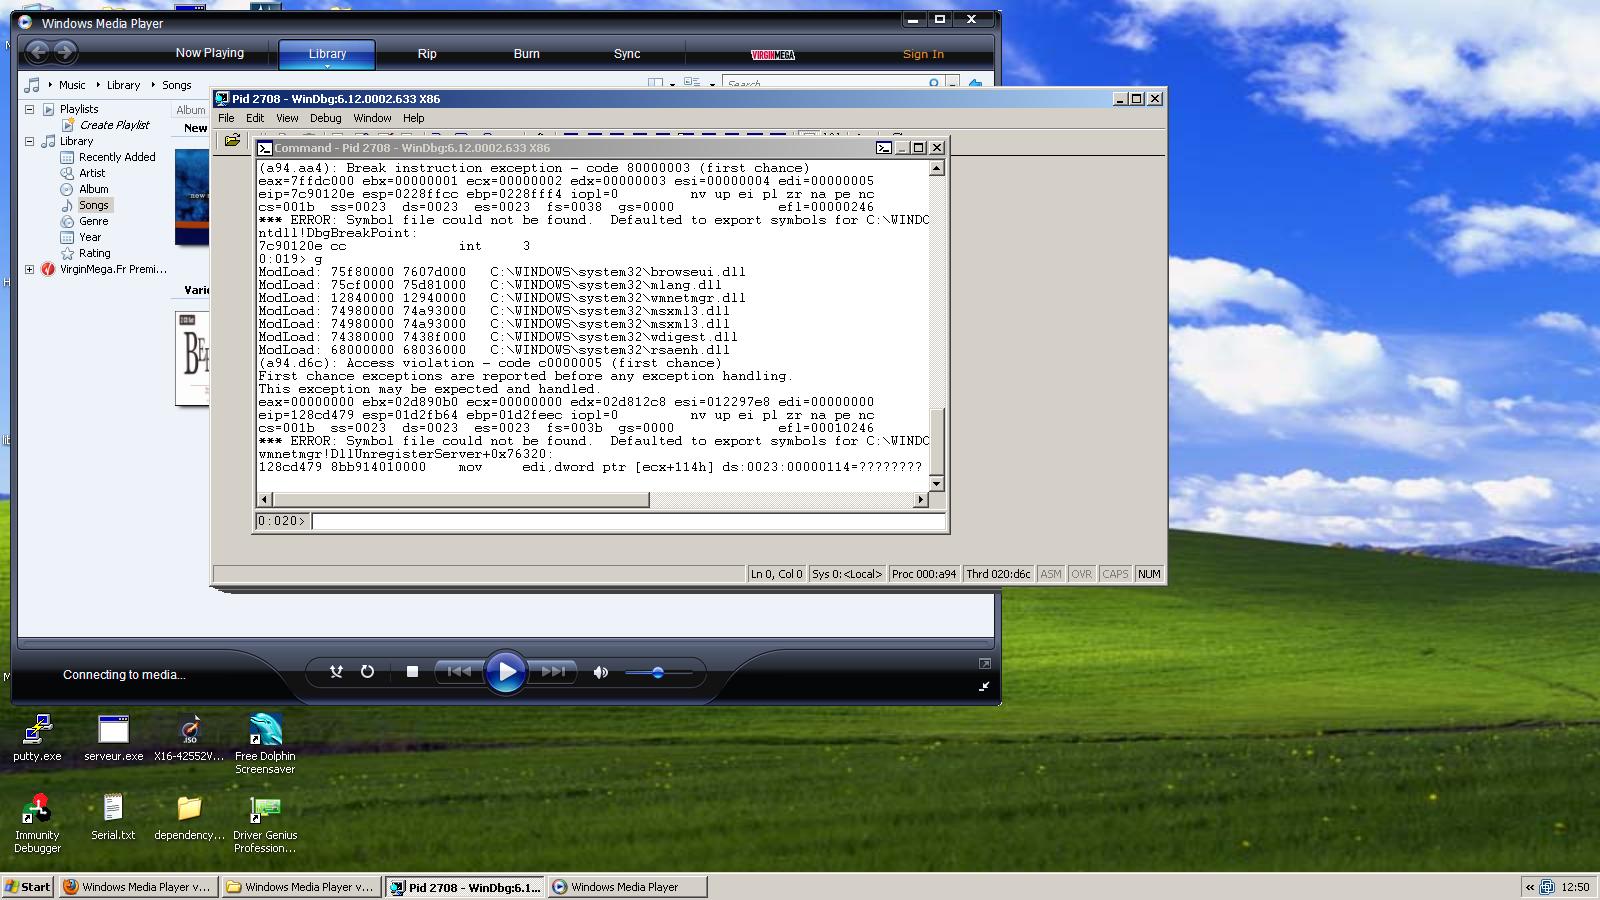 Microsoft Windows Media Player 11 0 5721 5262 - Remote